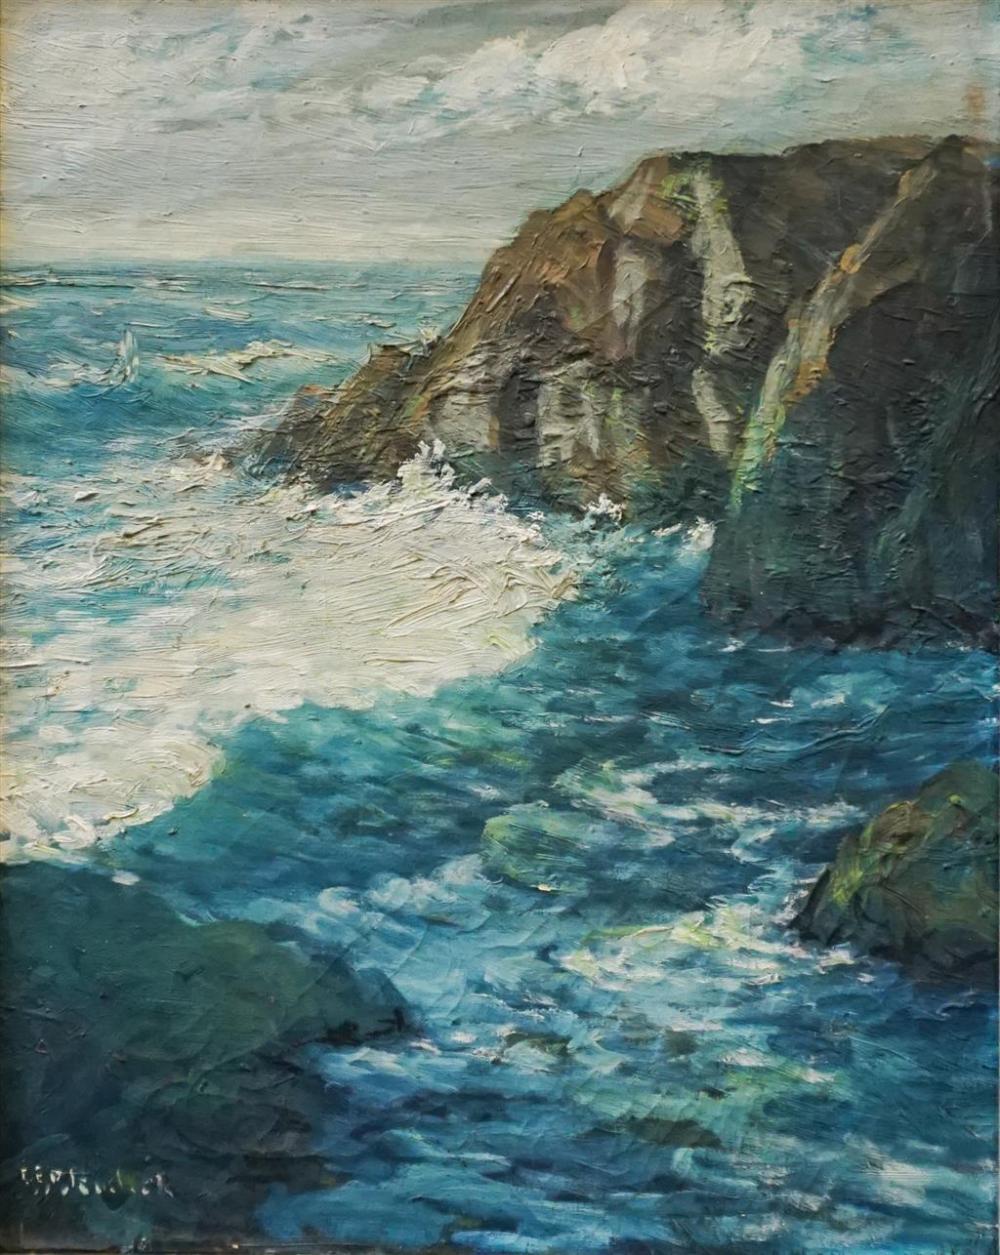 American School, 20th Century, New England Coastal Scene, Oil on Canvas, Signed l.l., Frame: 25 x 20-3/4 in